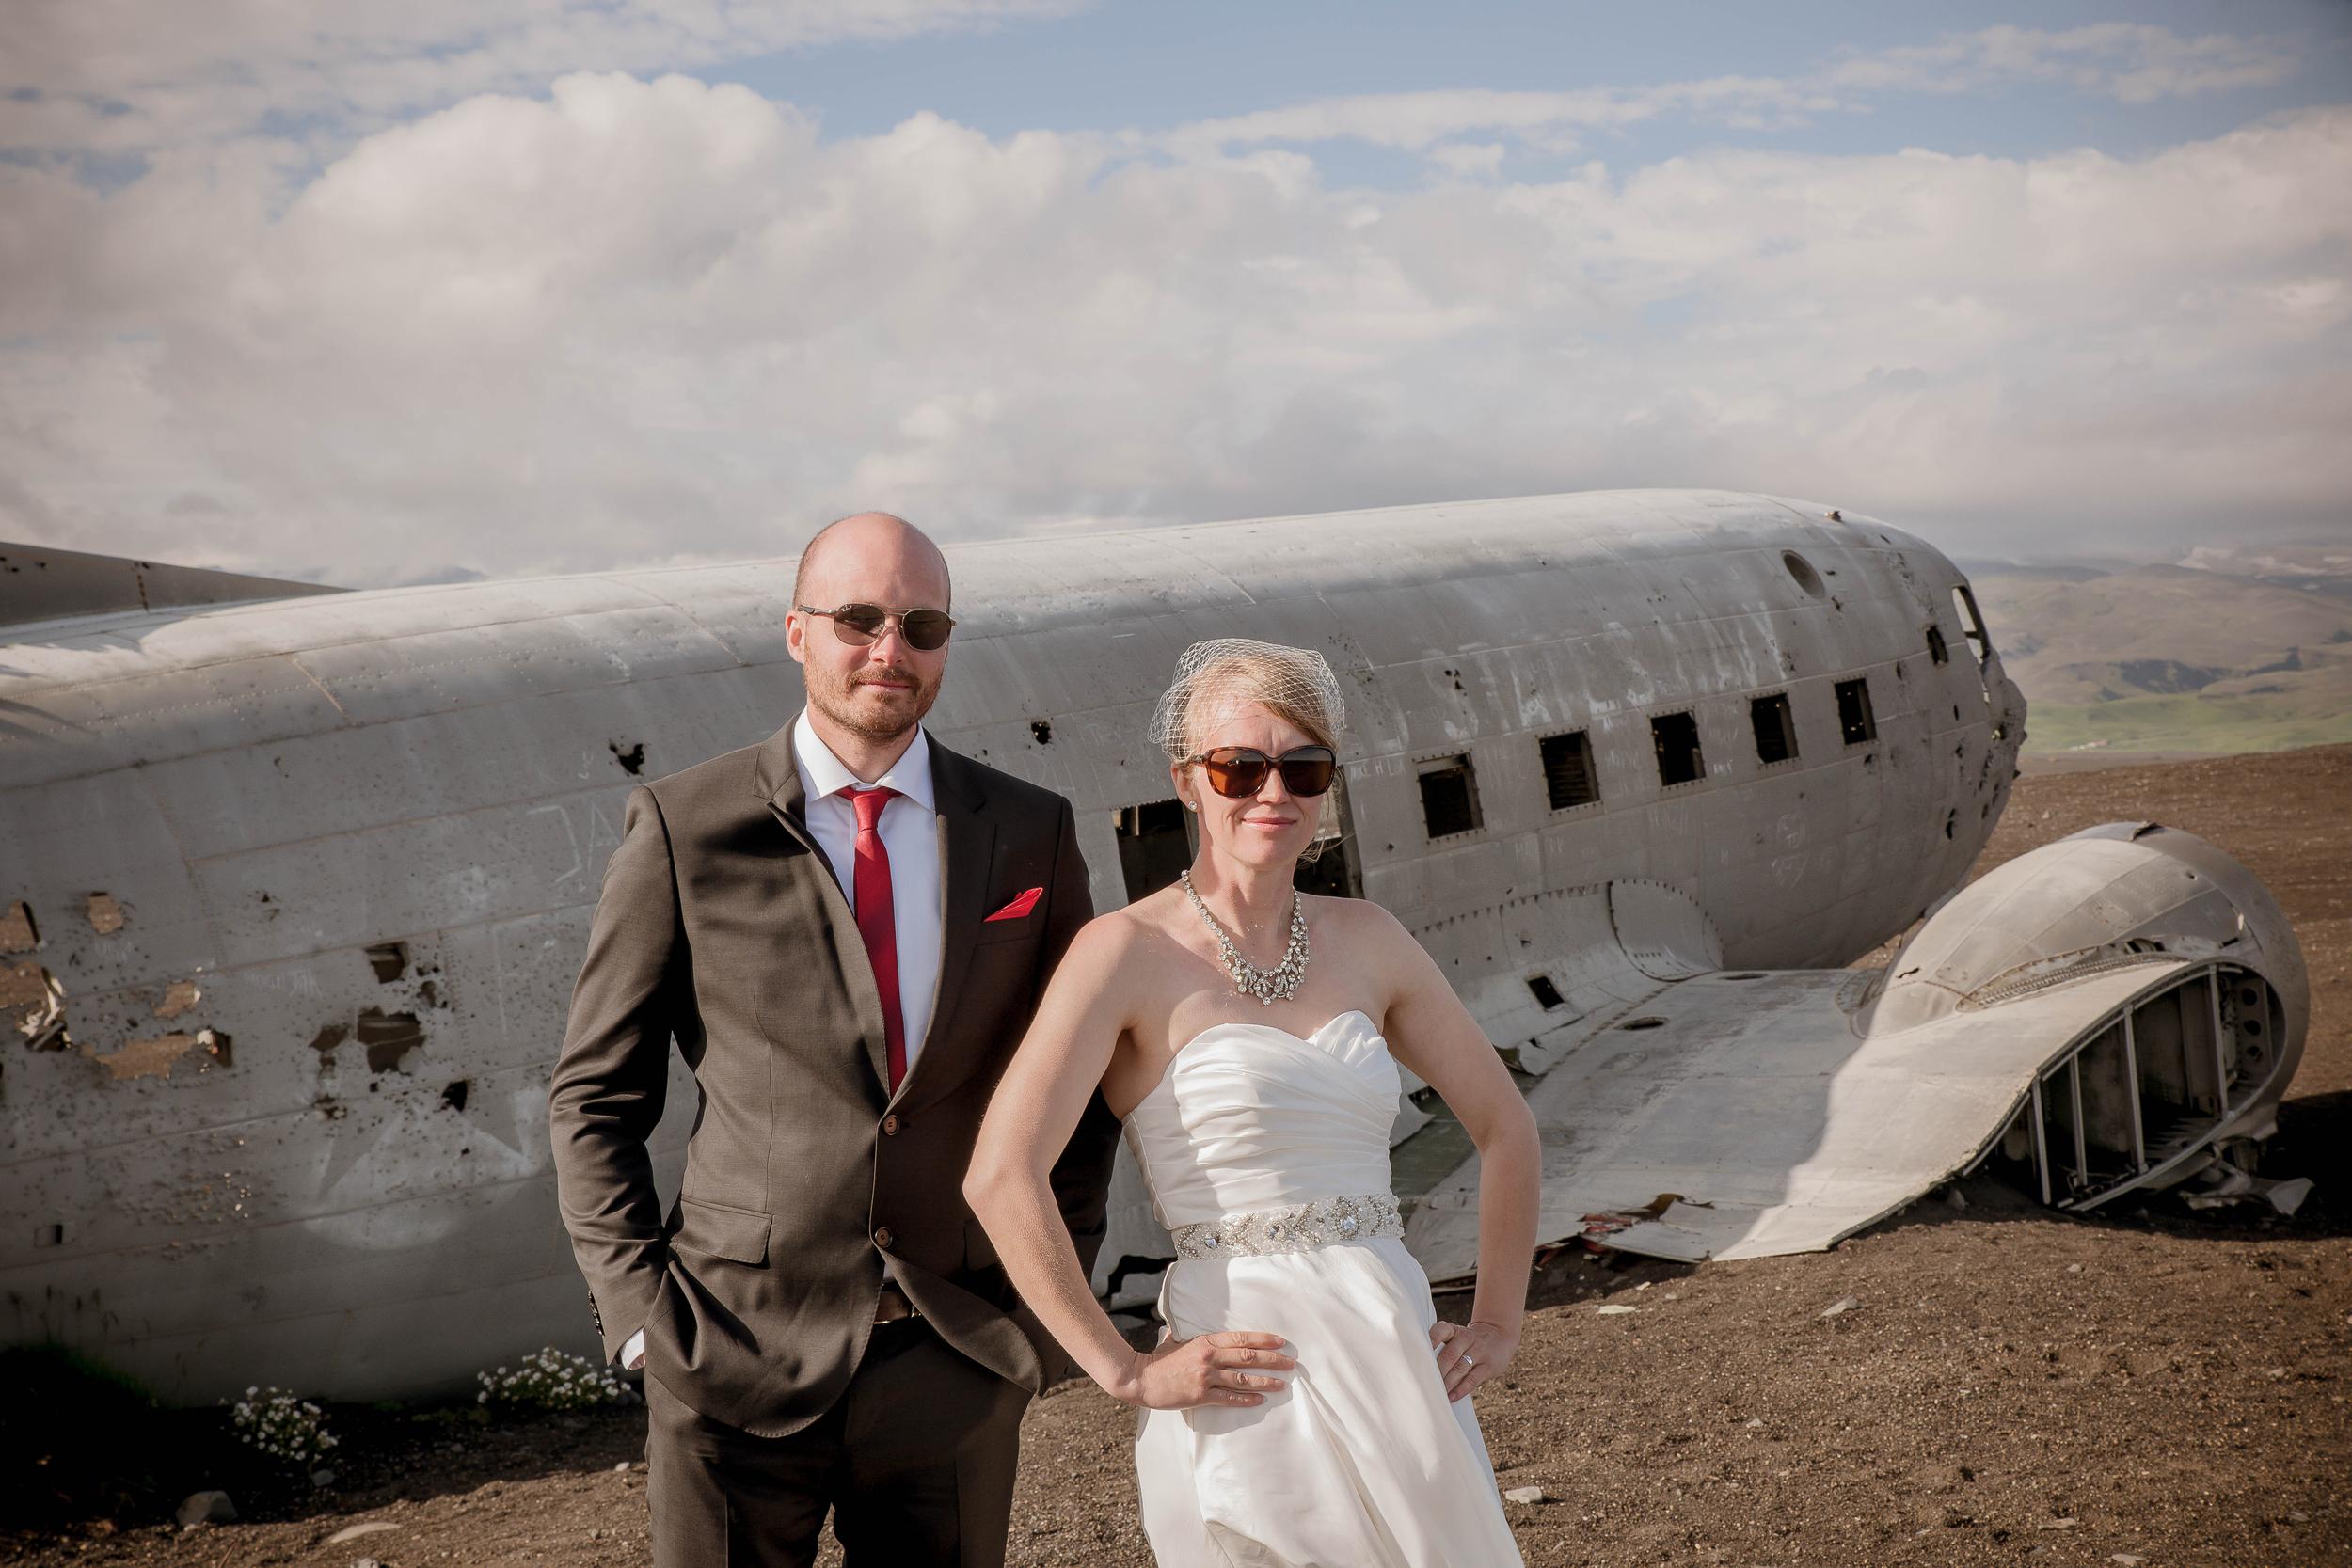 Iceland Crashed Airplane Wedding Photos by Miss Ann-8.jpg